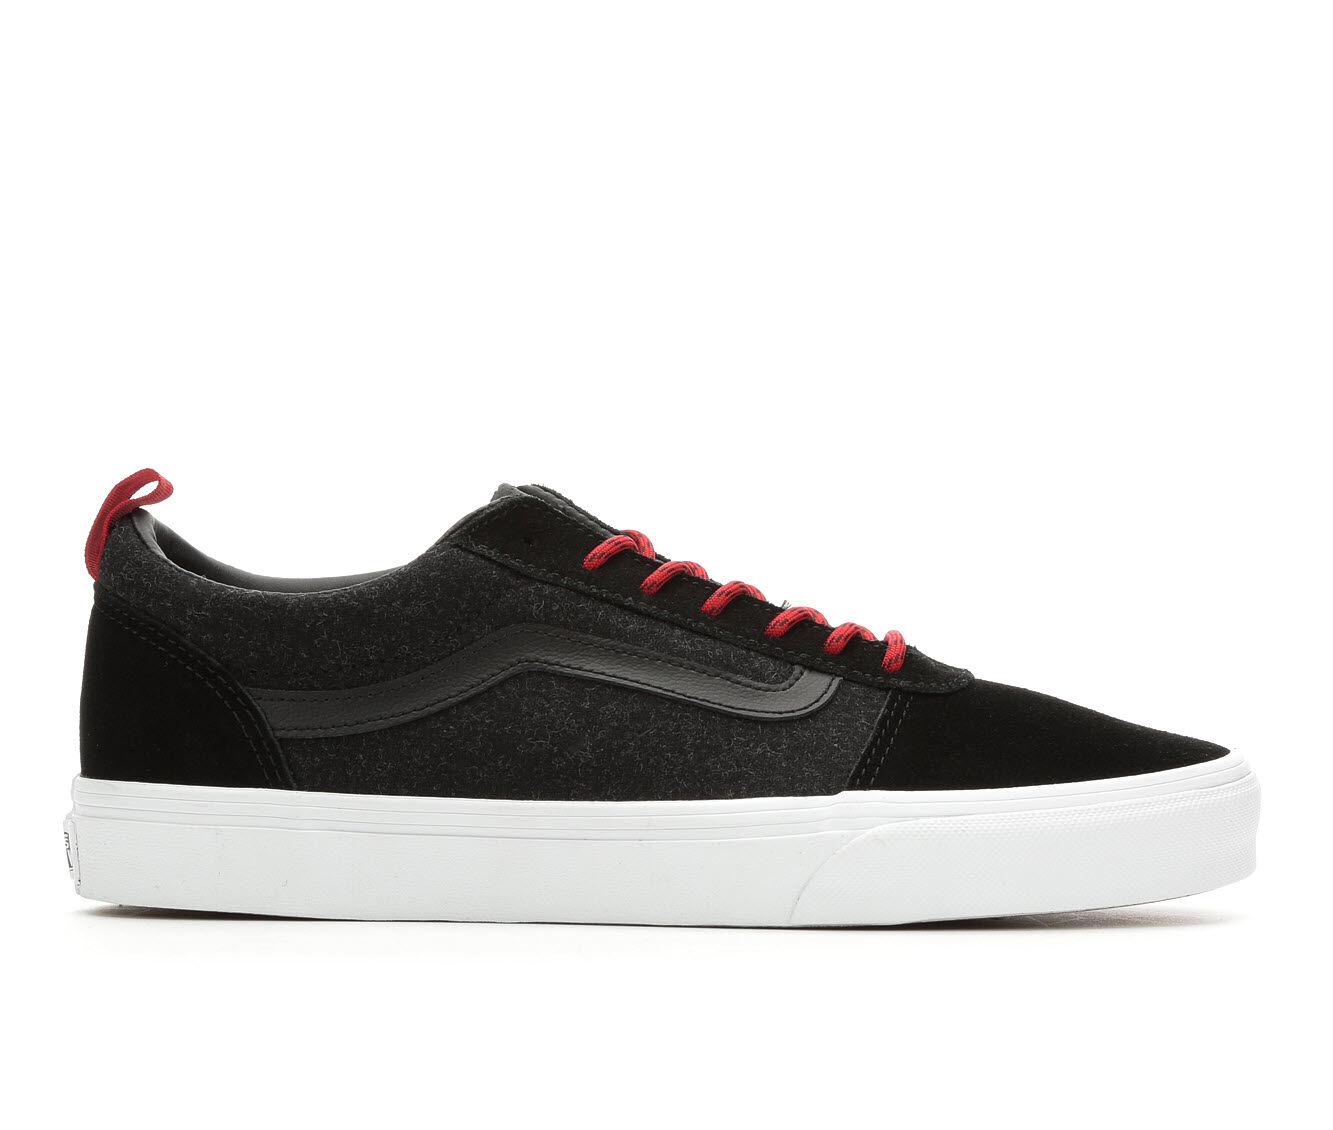 uk shoes_kd0994